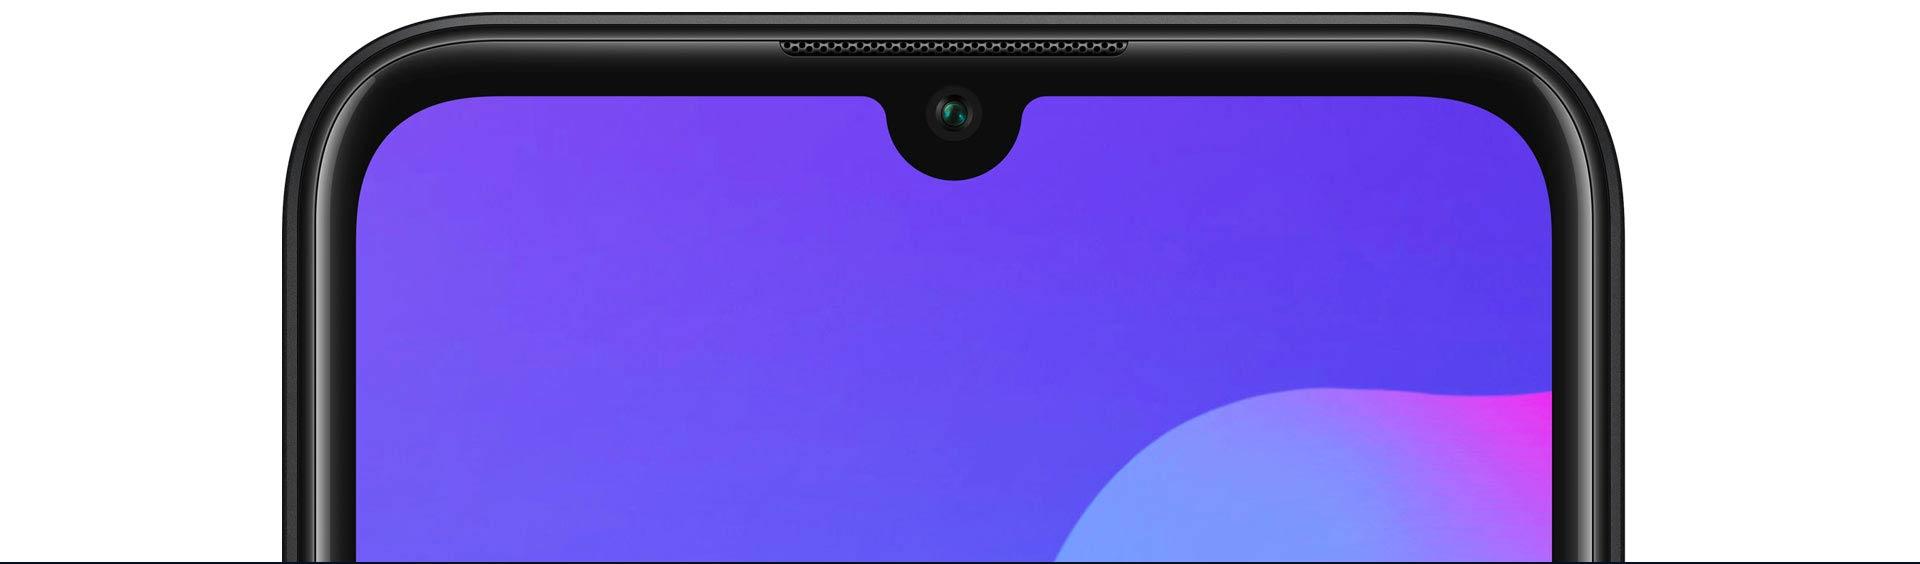 Honor 8A Экран смартфона